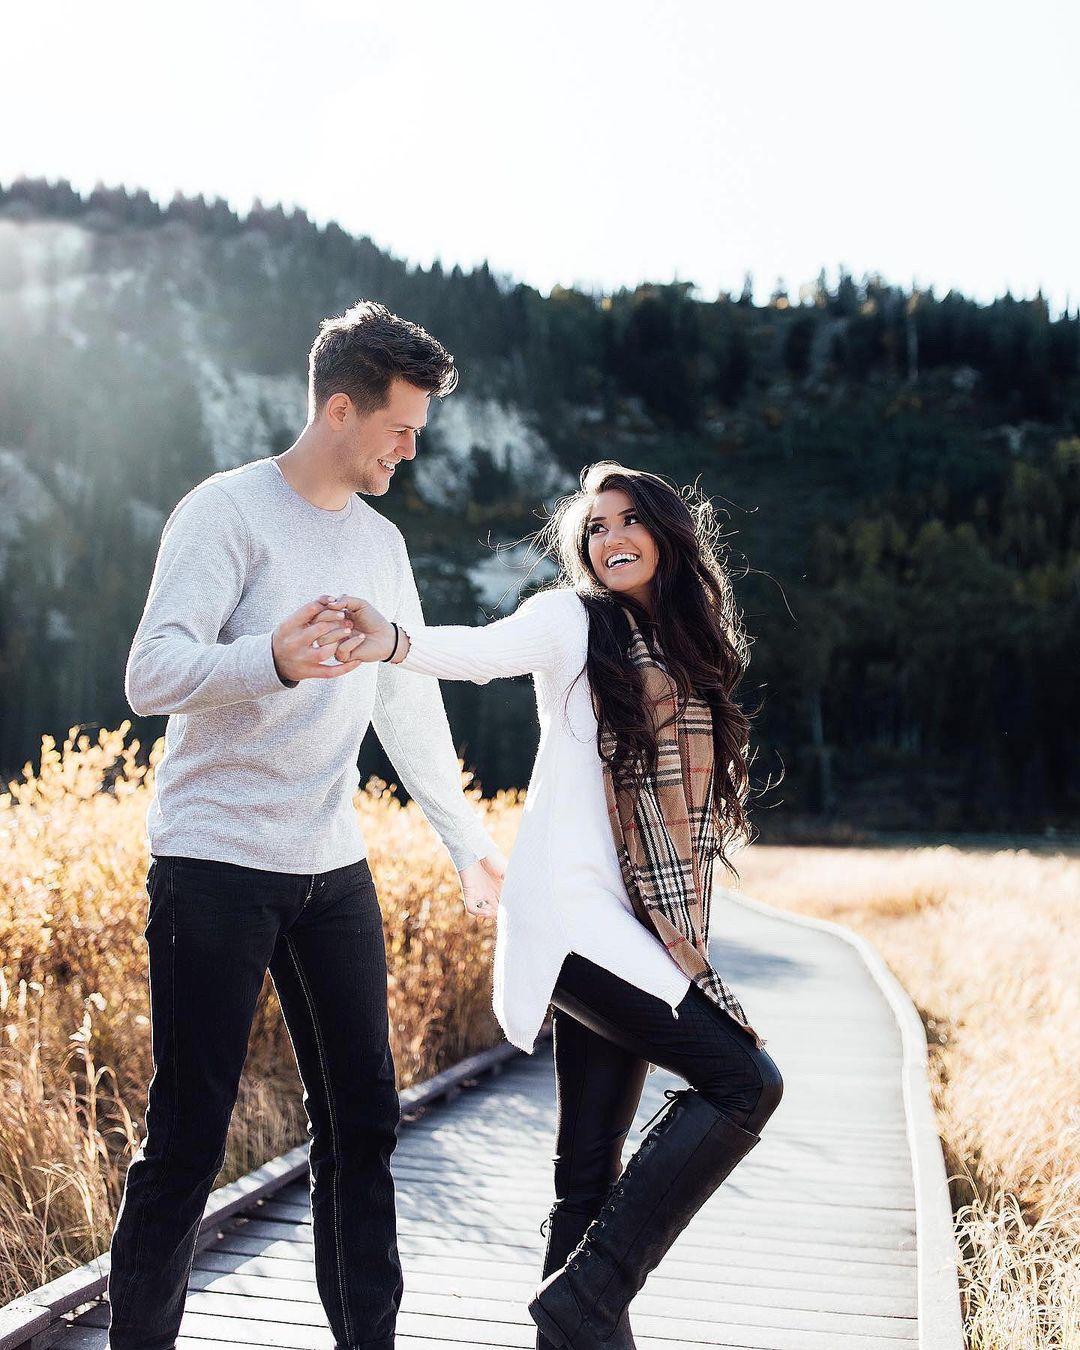 17 Relationship Goals 💑 College Aged 🏫 Girls Should Have 🙌🏼 ...